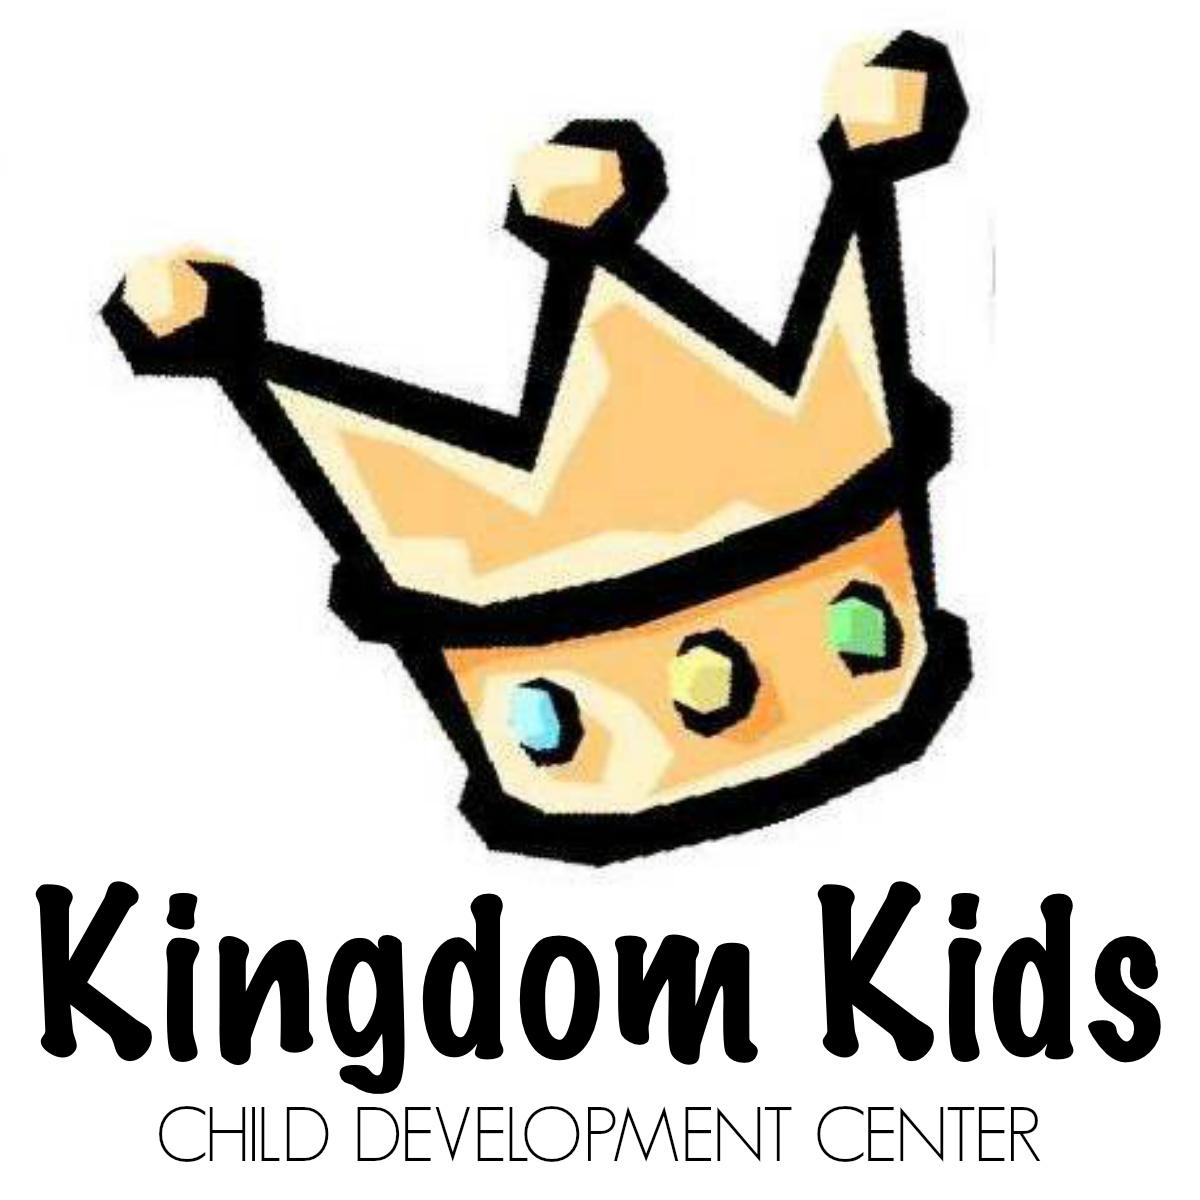 Kingdom Kids Child Development Center